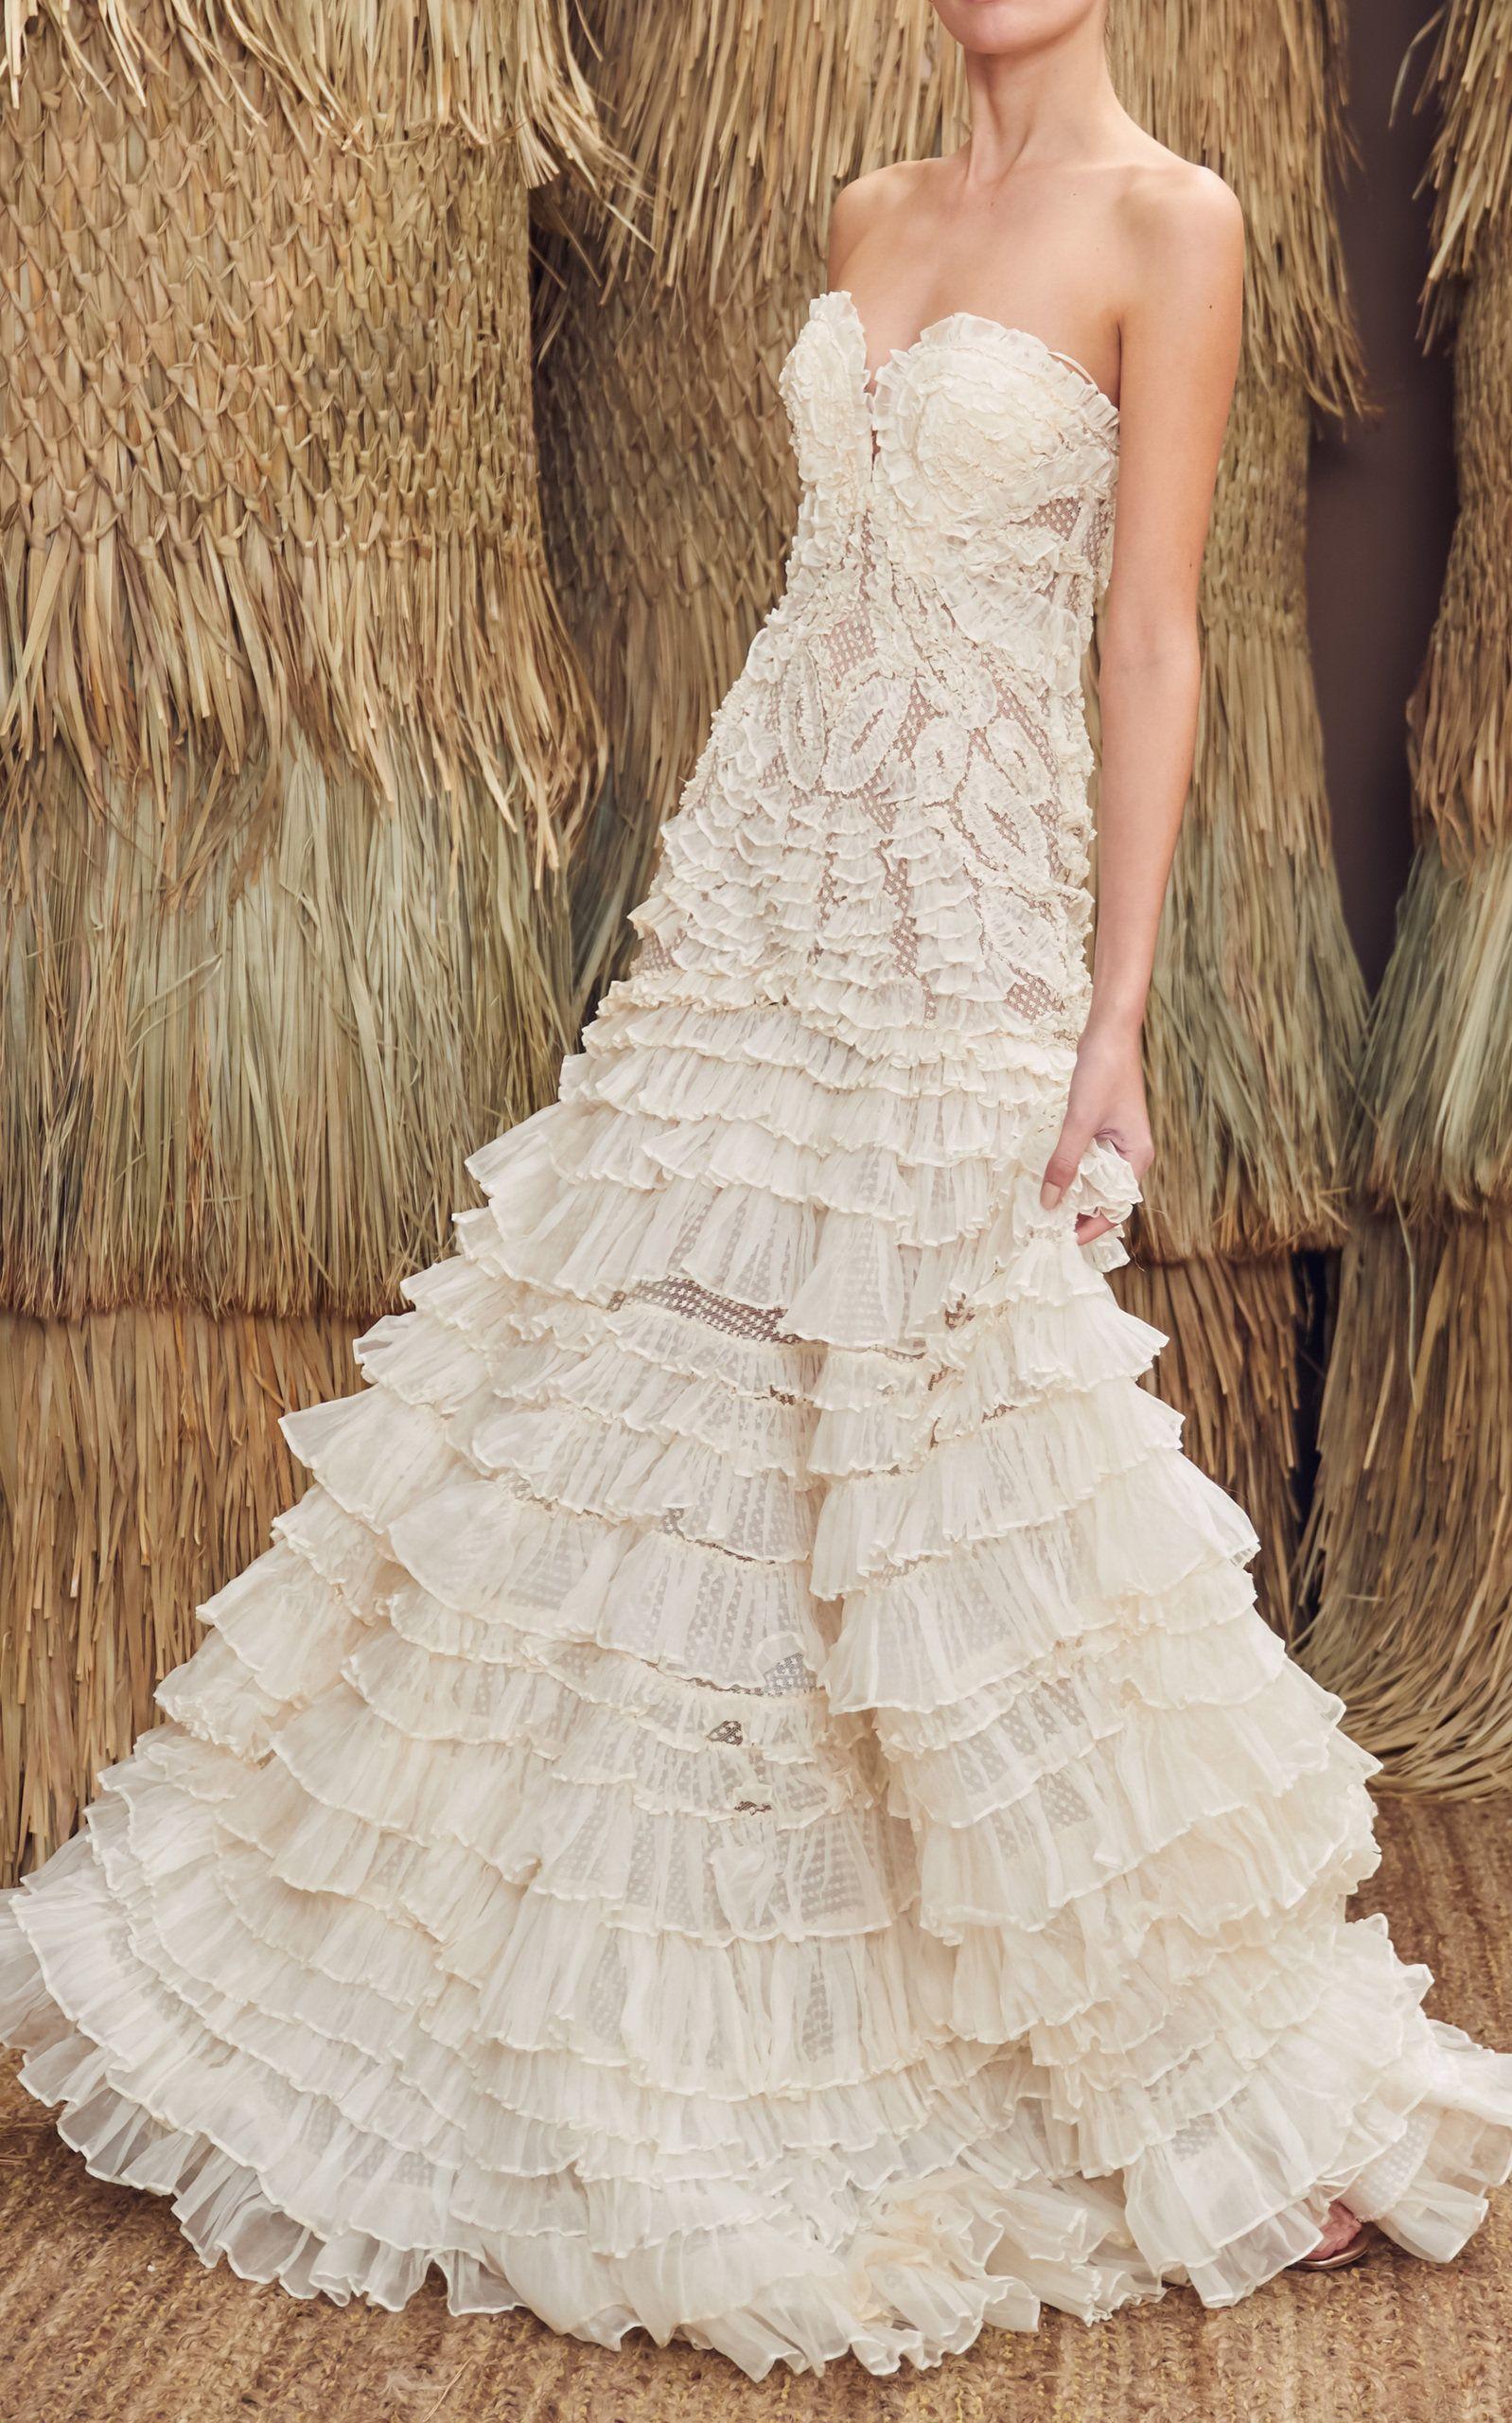 Tiered Ruffle Wedding Dress